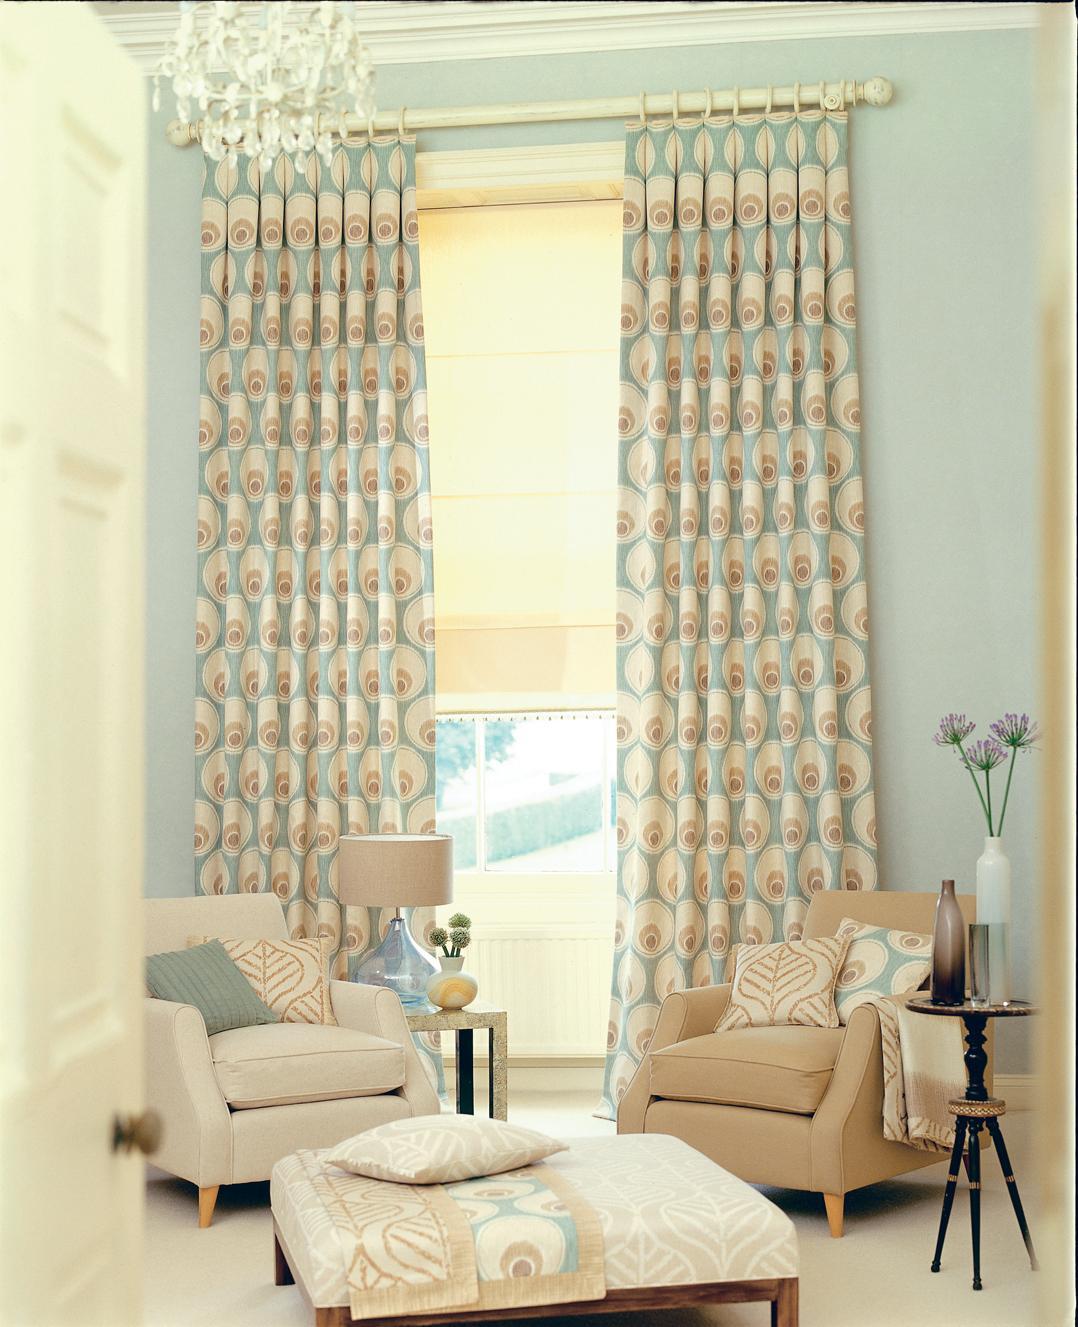 Curtain Ideas for Sliding Glass Door | My Decorative on Draping Curtains Ideas  id=77754